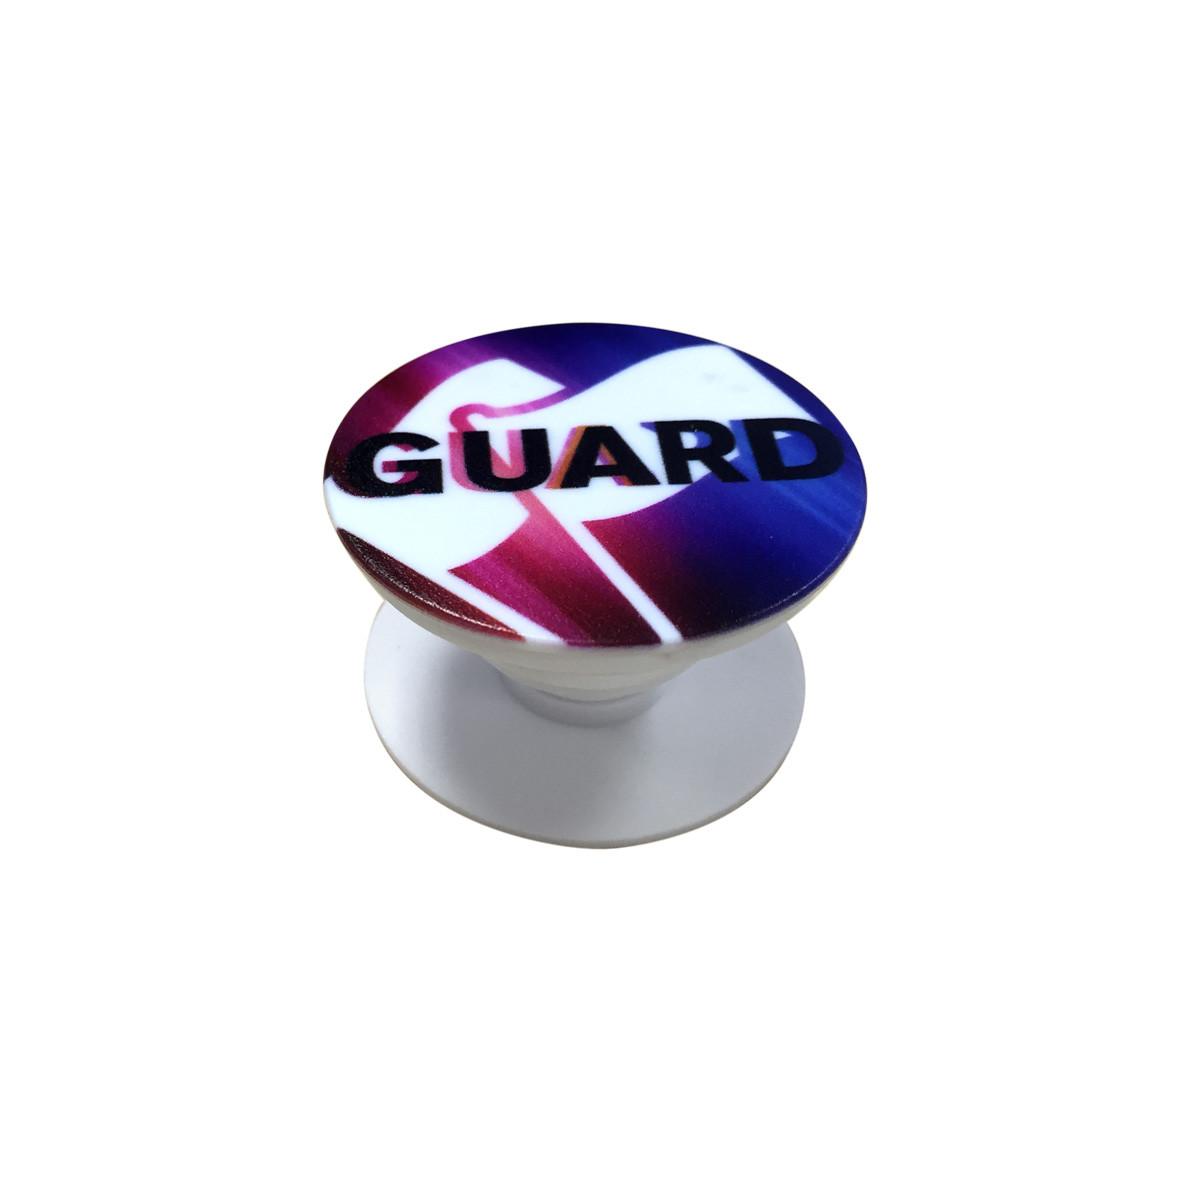 Guard Phone Grip